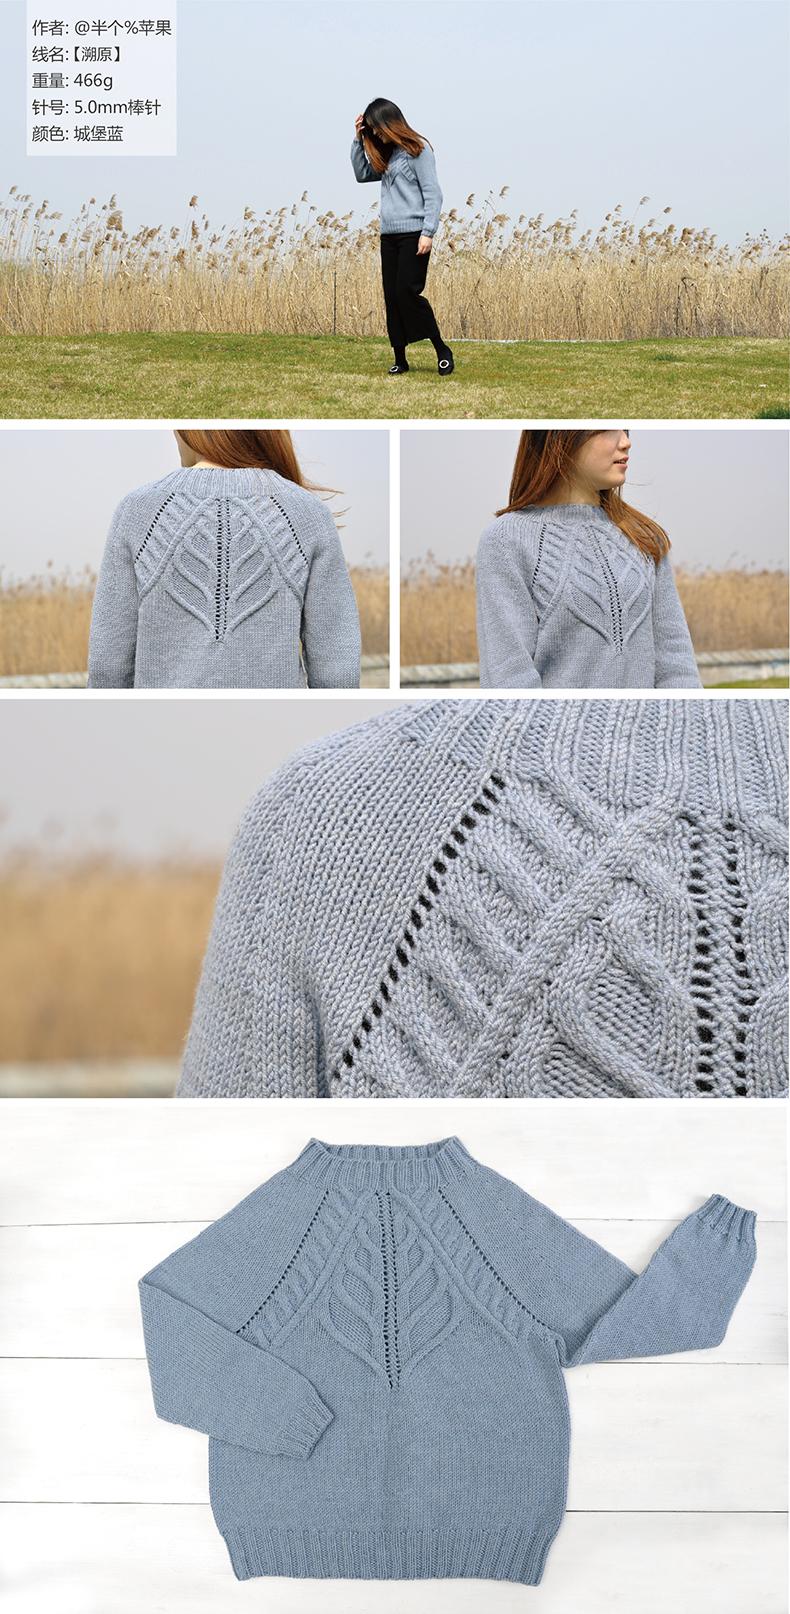 50g+100MPC 100% Merino Wool Yarn Middle Thick Yarns For Hand Knitting High Quality Warm Wool Yarns Hat Scarf Yarns For Knitting (16)